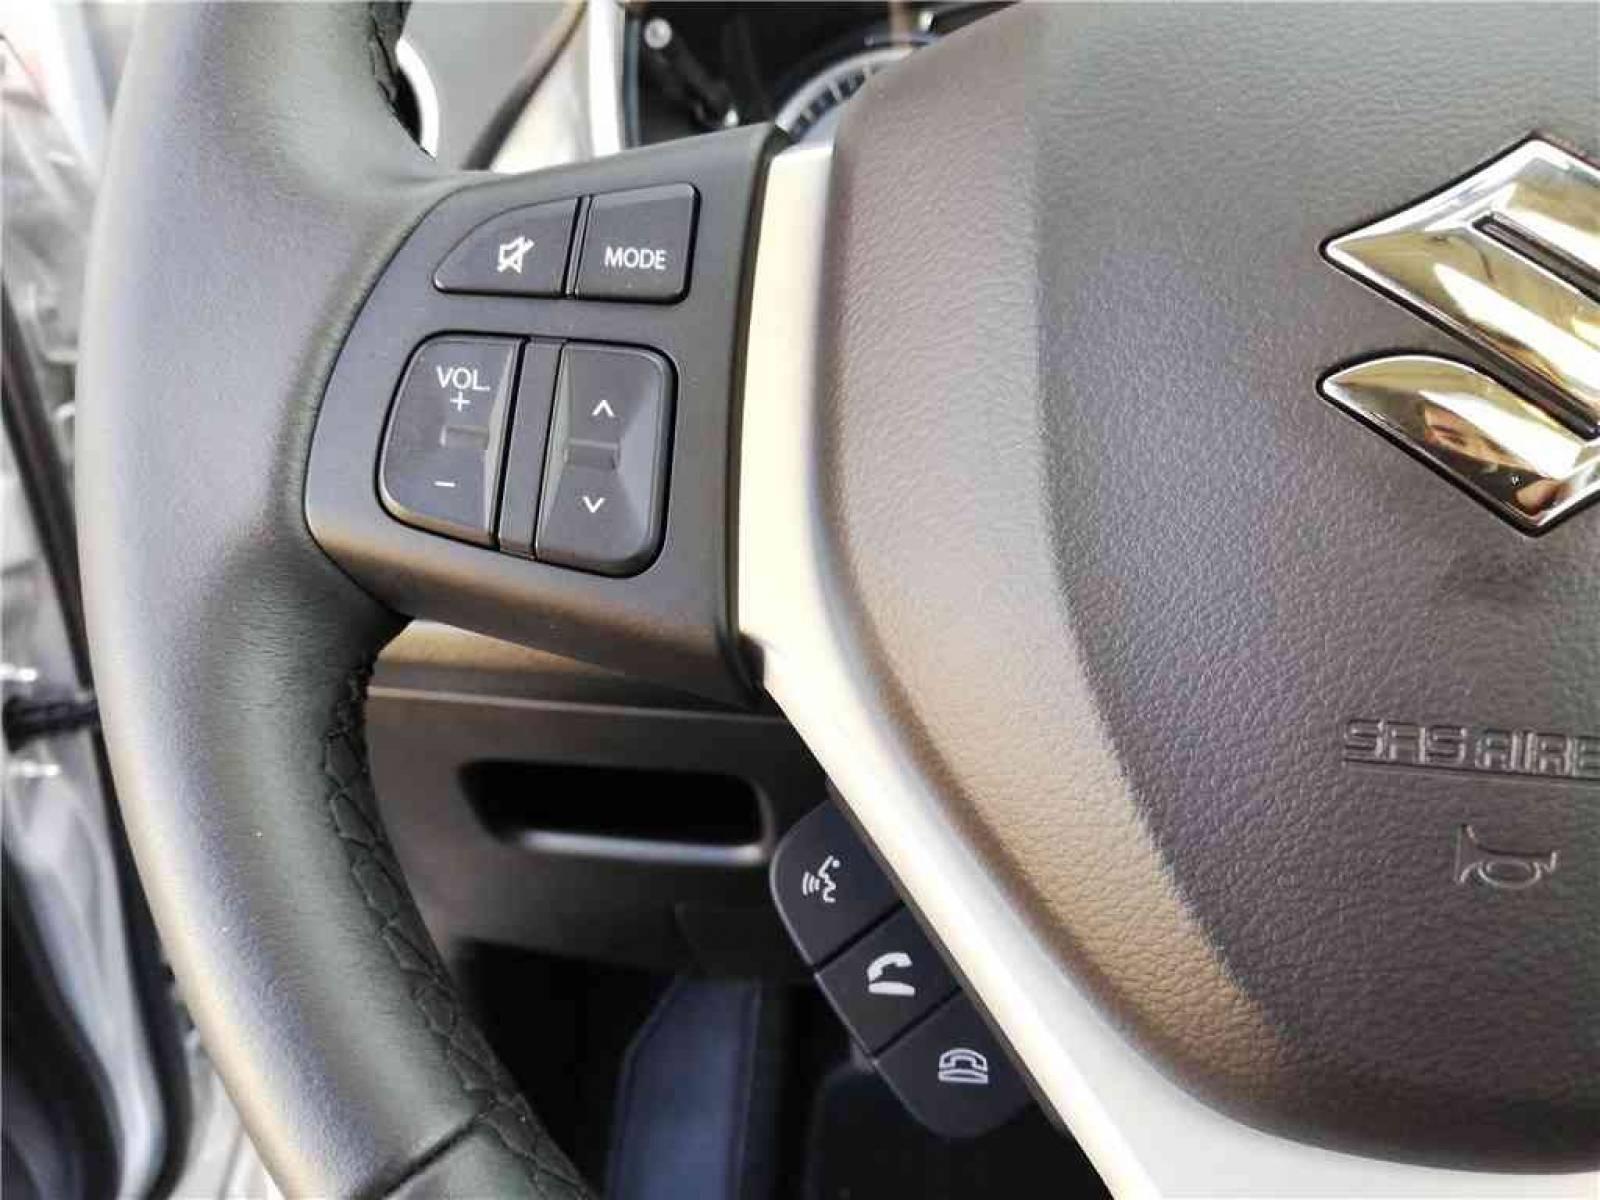 SUZUKI Vitara 1.0 Boosterjet - véhicule d'occasion - Groupe Guillet - Opel Magicauto - Chalon-sur-Saône - 71380 - Saint-Marcel - 20